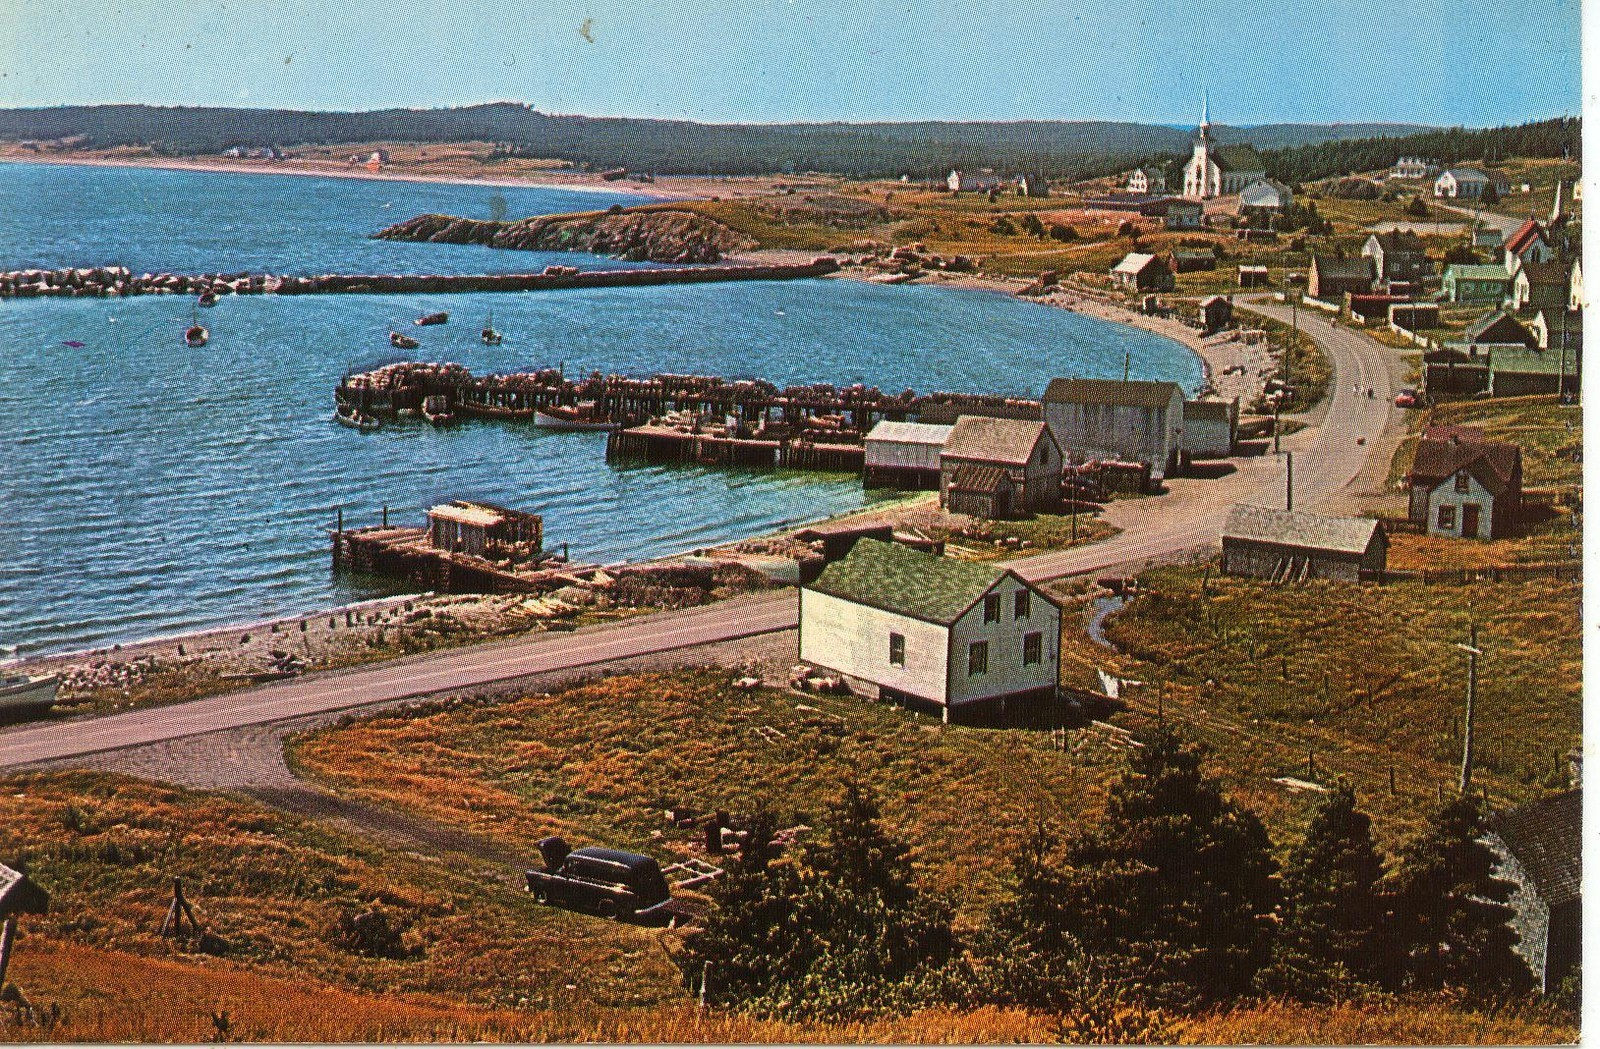 Nova scotia escorts cape breton Nova Scotia - WikiSexGuide - International World Sex Guide